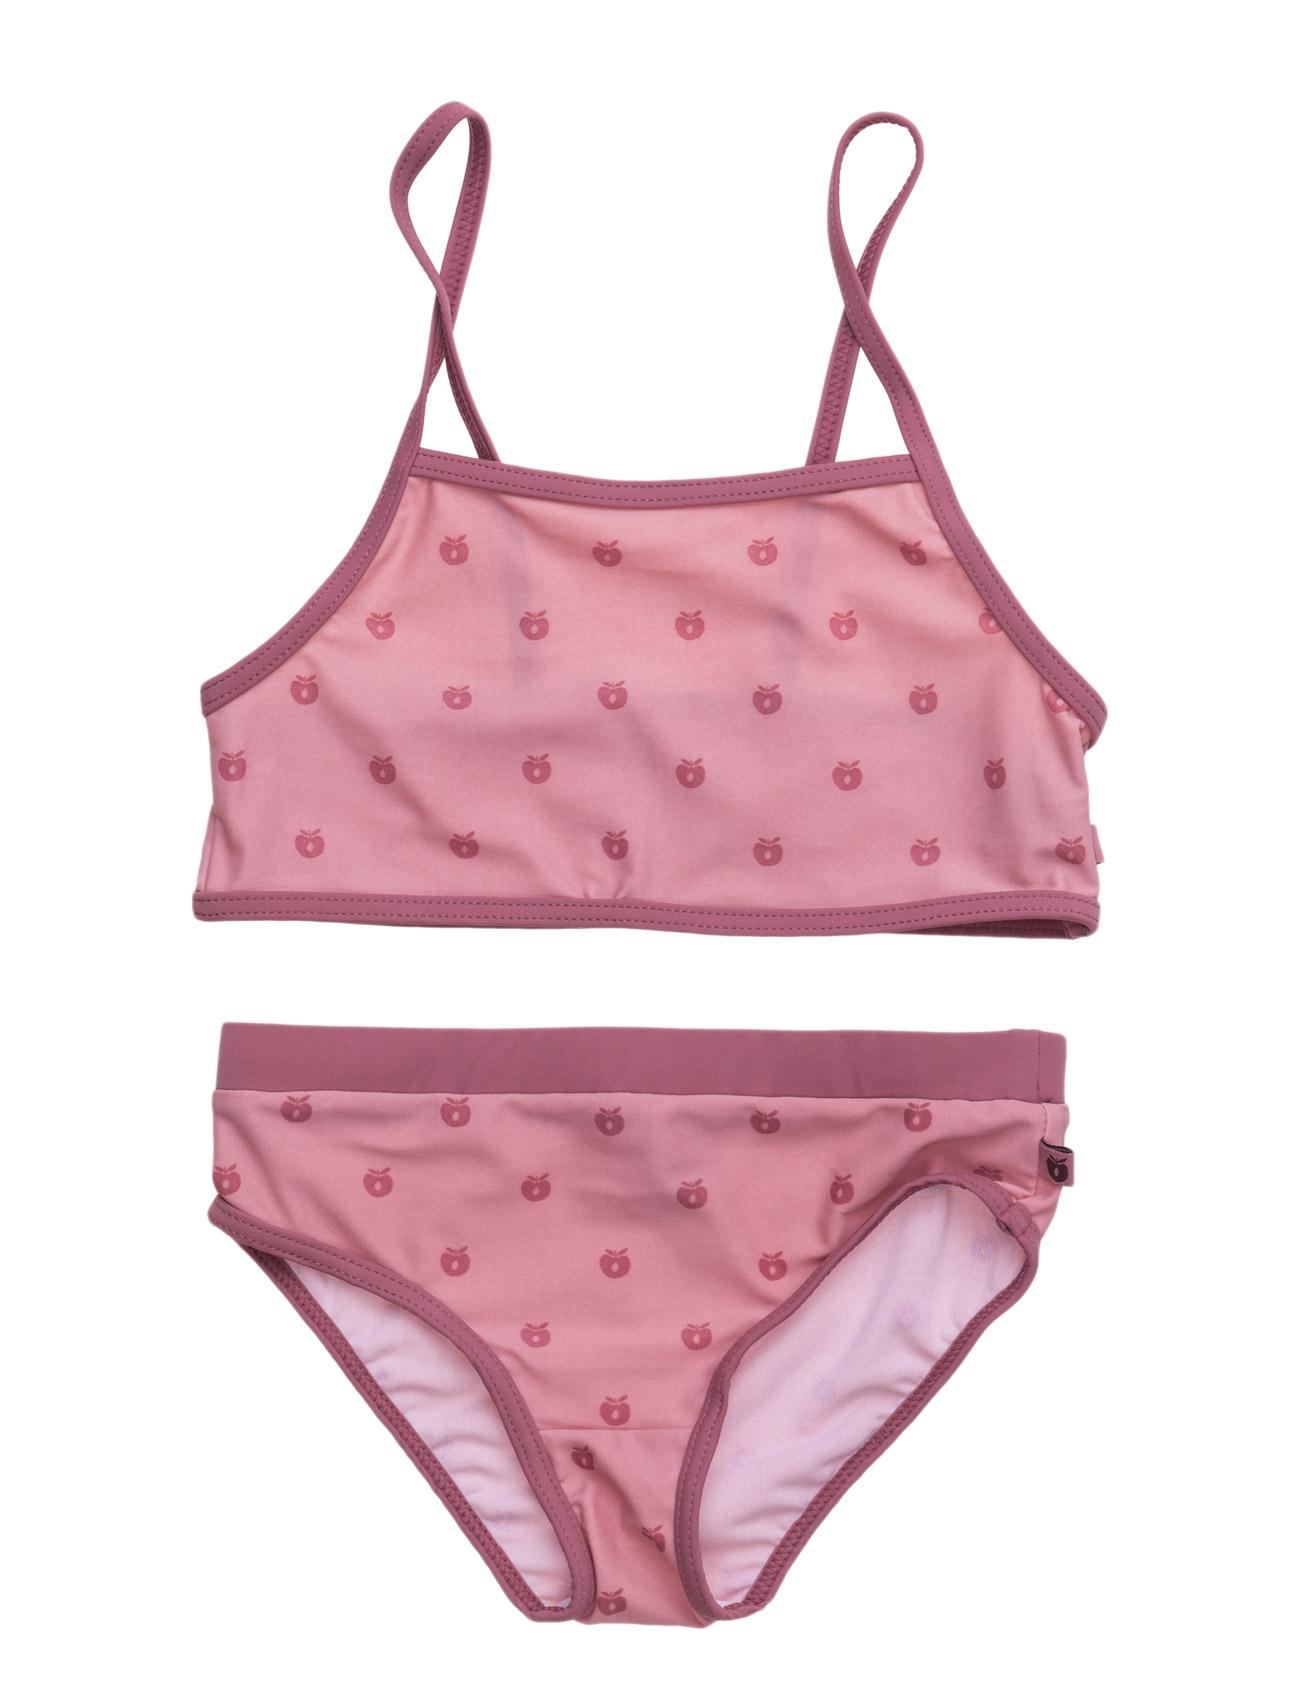 Swimwear, Bikini, Apples Småfolk Badetøj til Piger i Rødme